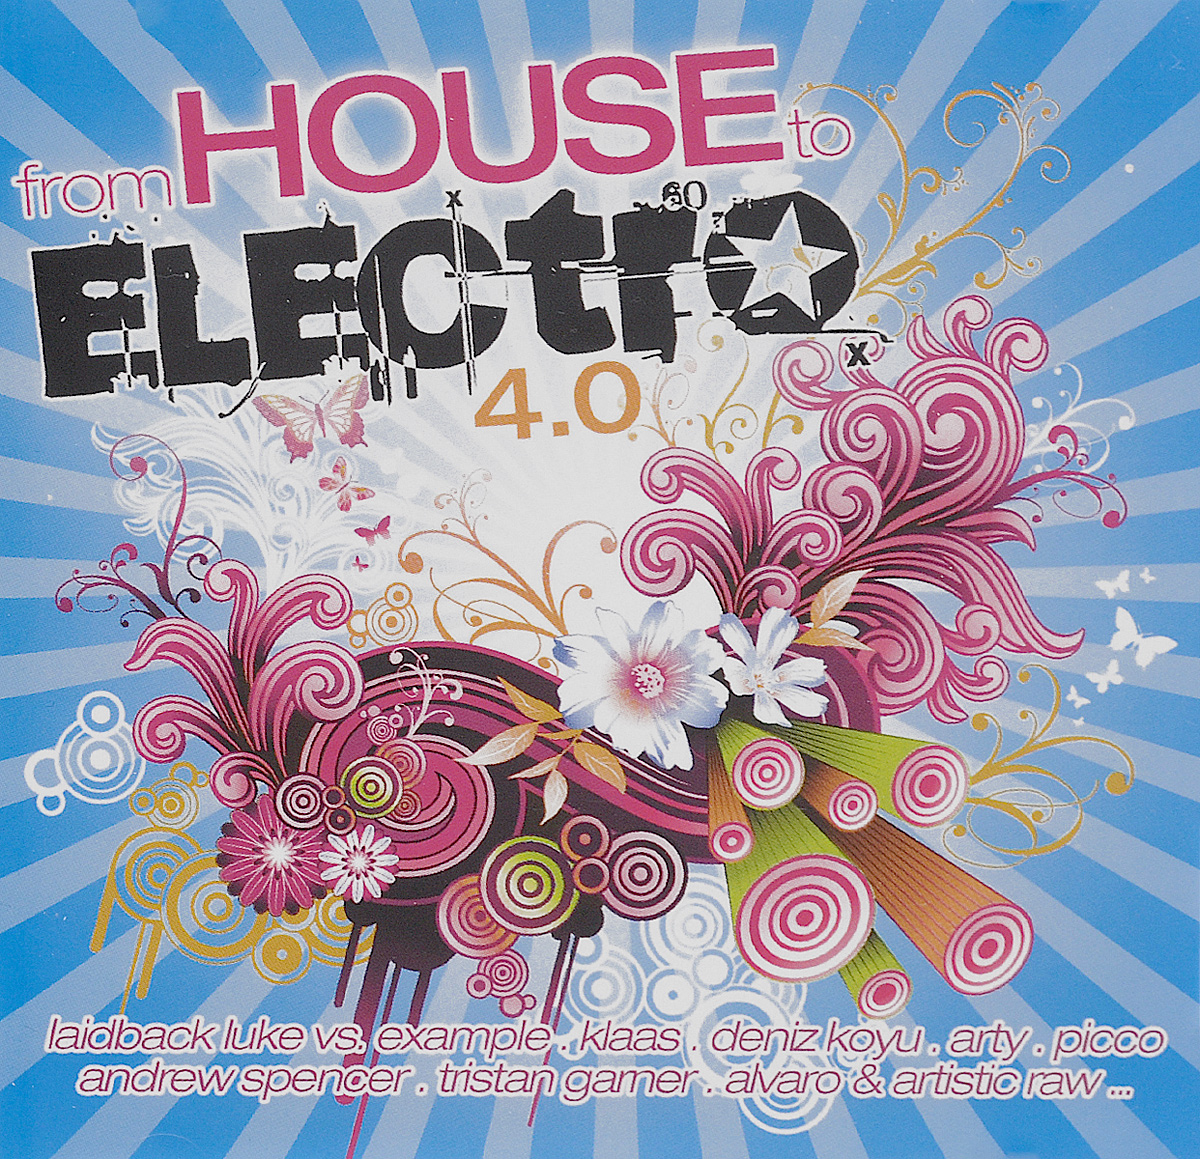 Laidback Luke,Example,Нильс Ван Гог,Klaas,Quintino,Tommy Trash,EDX,Рене де ла Моне,Alvaro,Ralvero,Эндрю Спенсер,Deniz Koyu,Джон Дэлбэк,G&G,P.s.y.,Флориан Арндт,Тристан Гарнер,Jordy Lishious,Froidz,Джесс Воорн From House To Electro 4.0 (2 CD) electro house 2015 2 cd